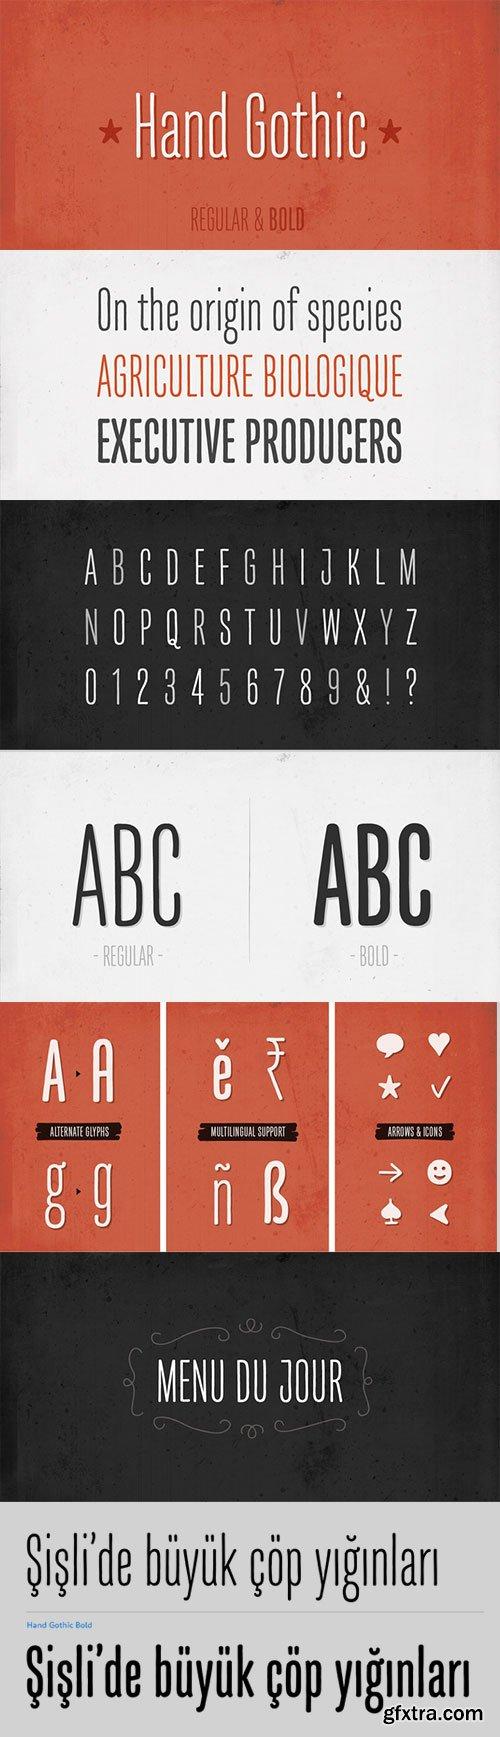 Hand Gothic - New Condensed Typeface 2xOTF $42